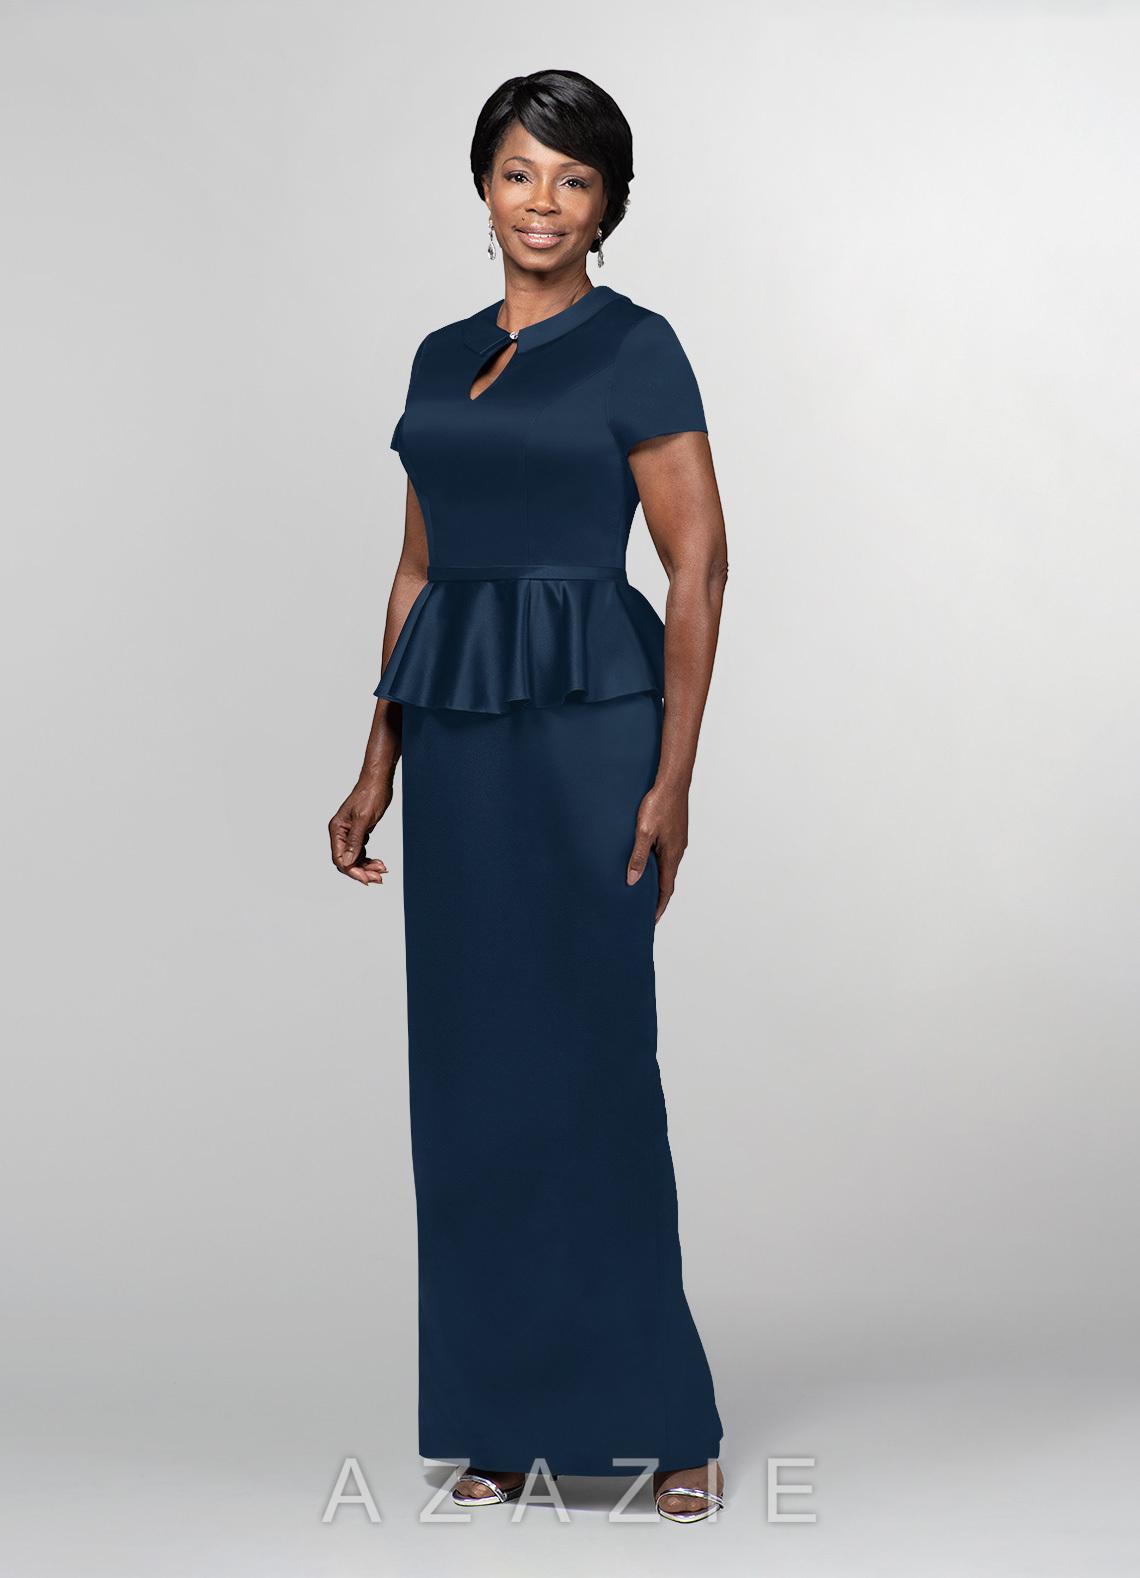 de60e06d3a92 Azazie Greer MBD Mother Of The Bride Dress | Azazie